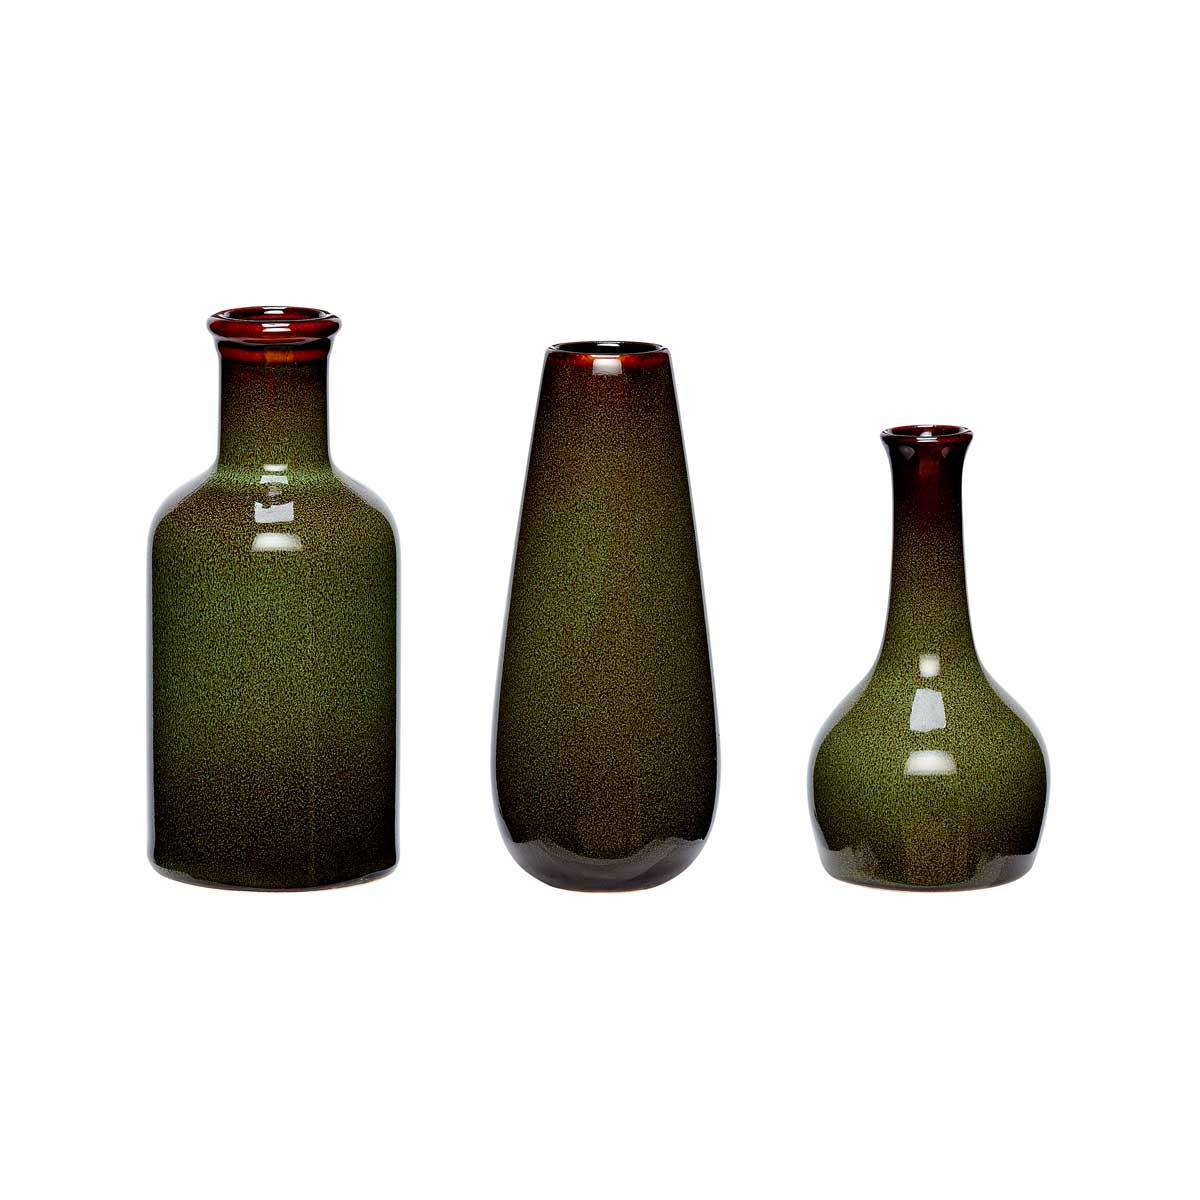 h bsch interior keramik vasen set gr n 3 st ck designhype. Black Bedroom Furniture Sets. Home Design Ideas